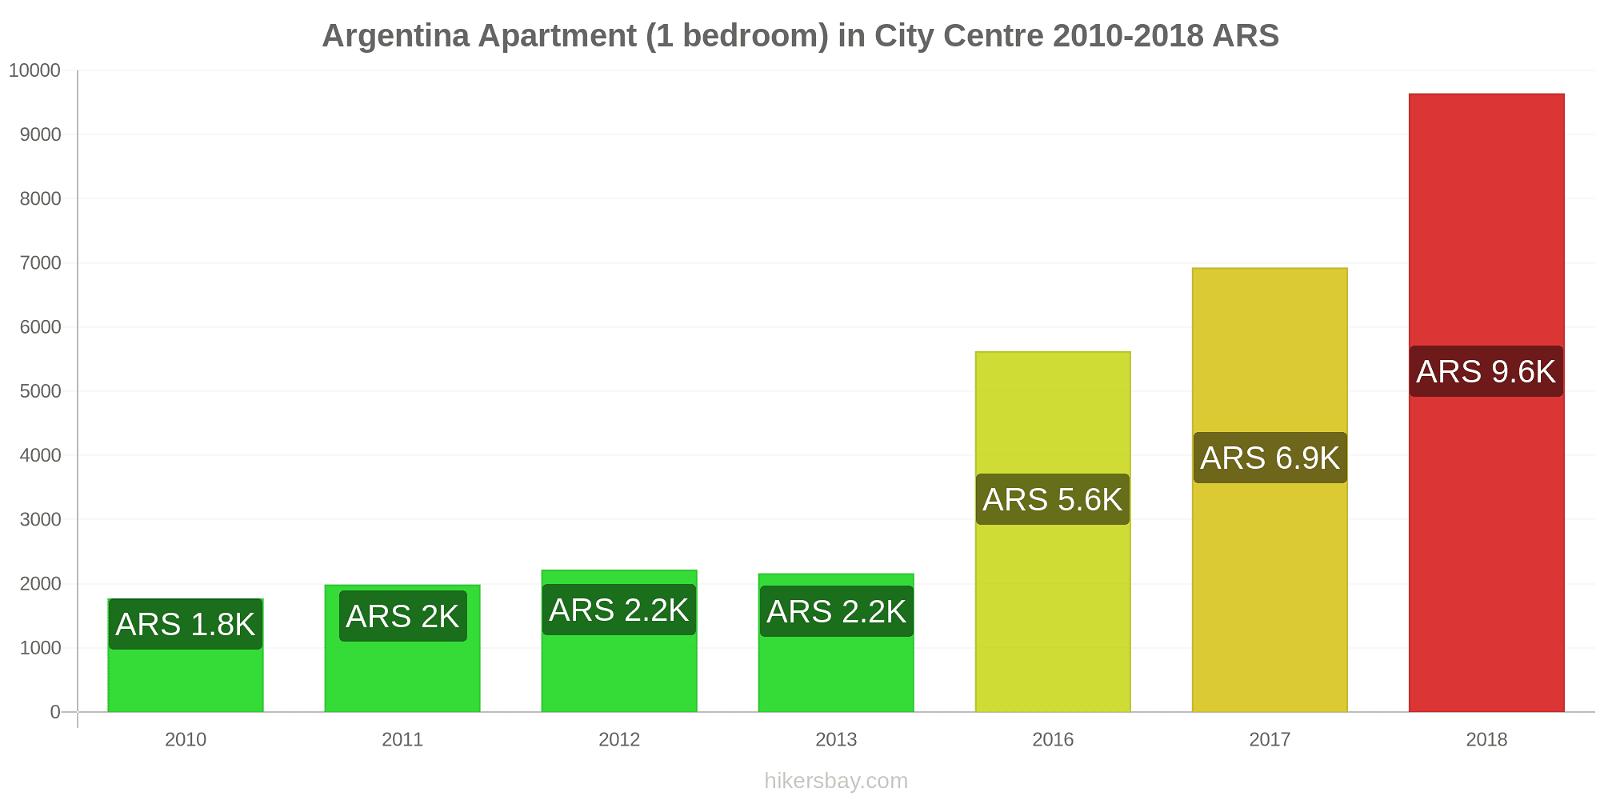 Argentina price changes Apartment (1 bedroom) in City Centre hikersbay.com